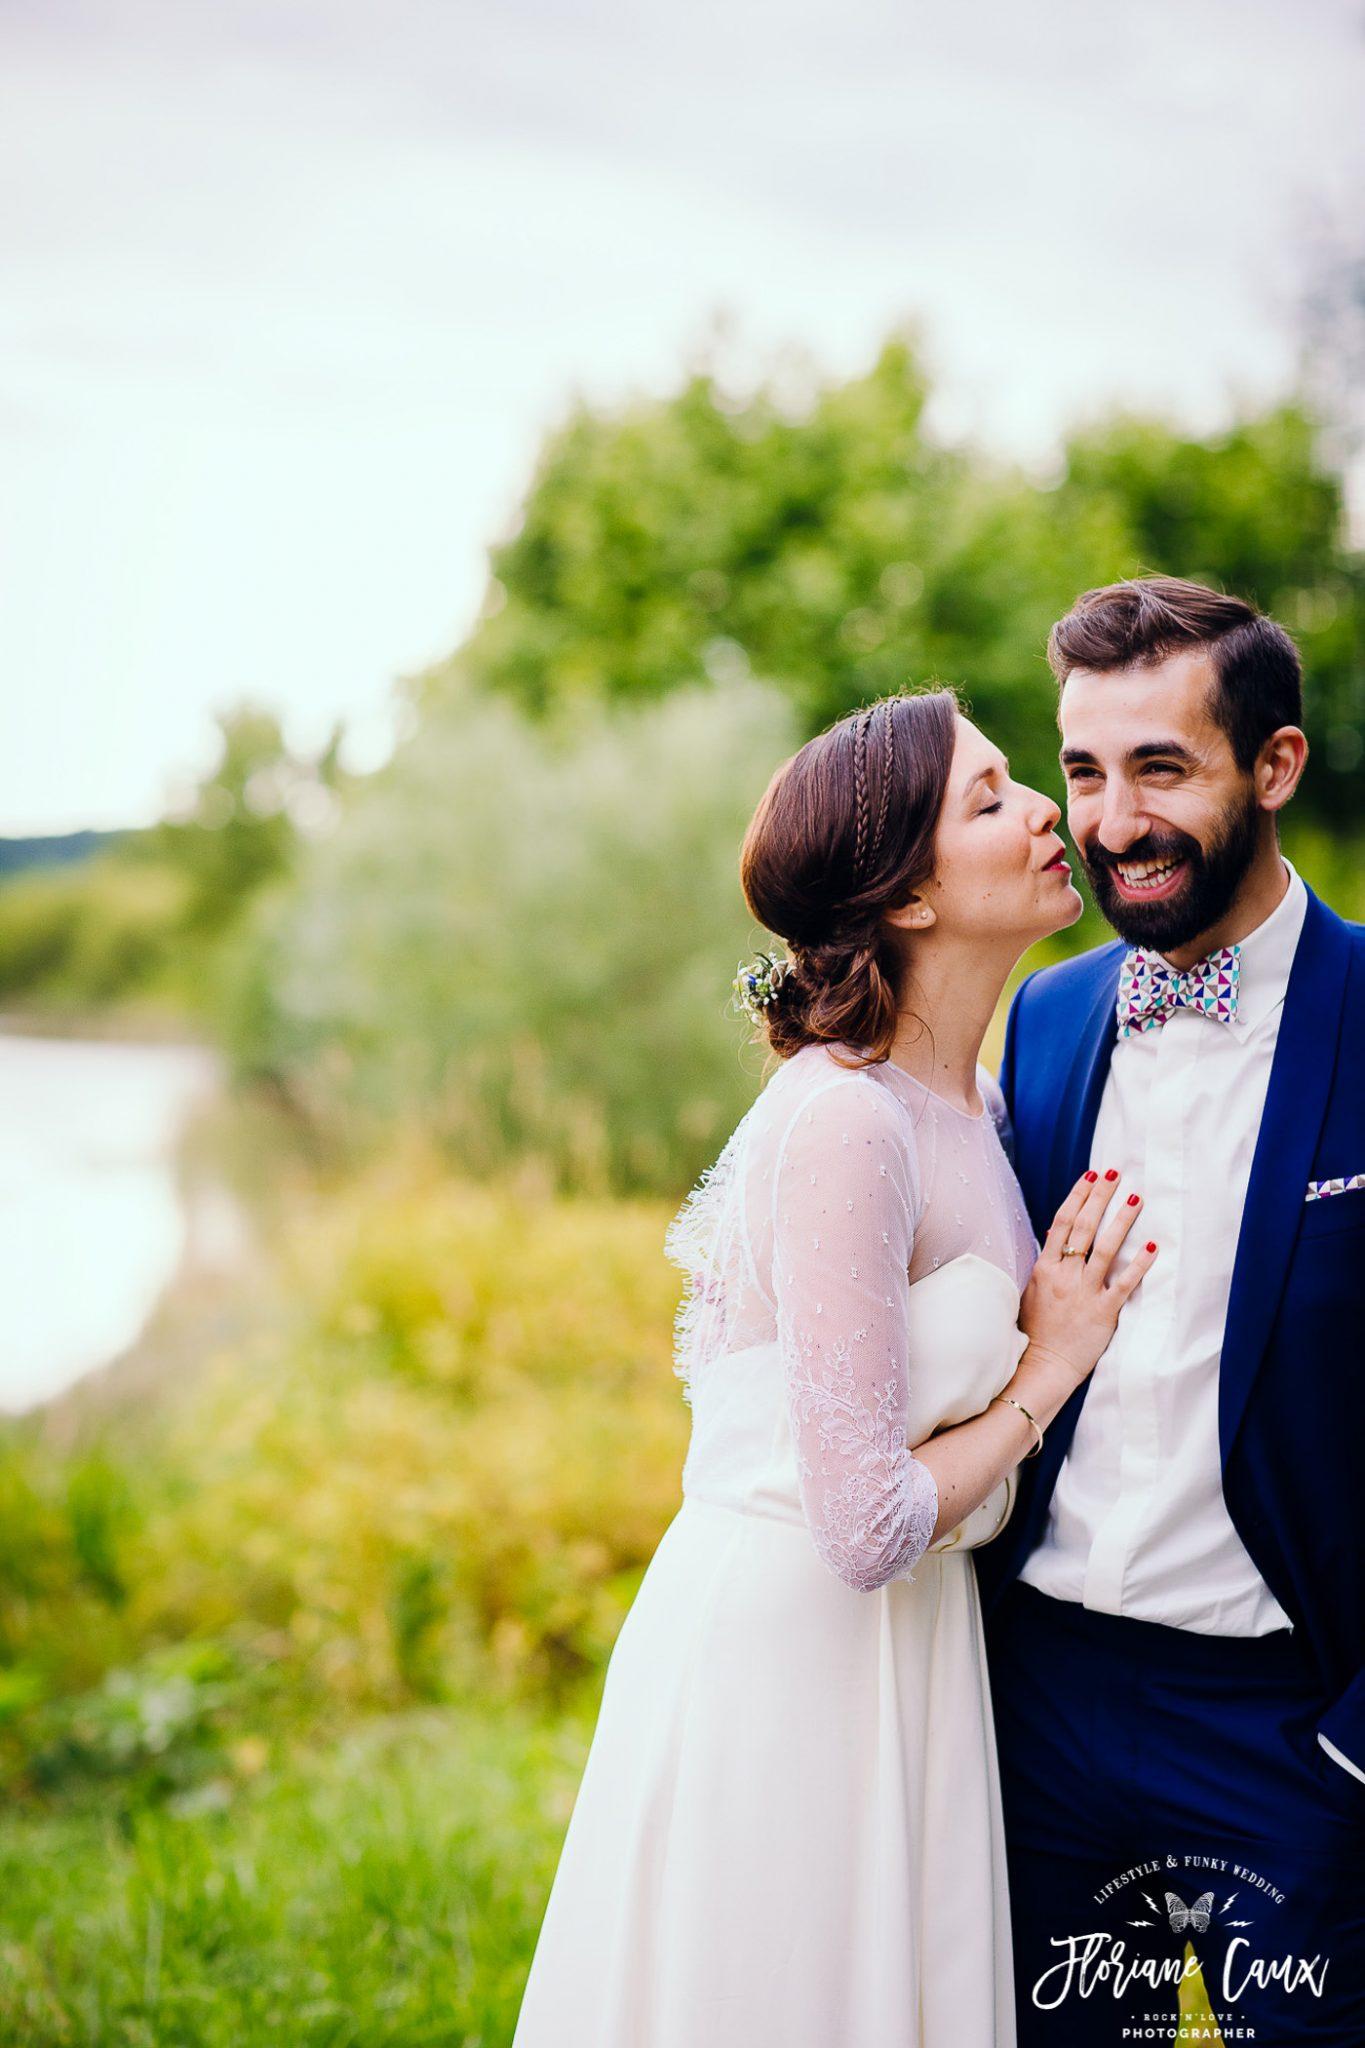 photographe-mariage-pays-basque-Floriane-Caux (41)